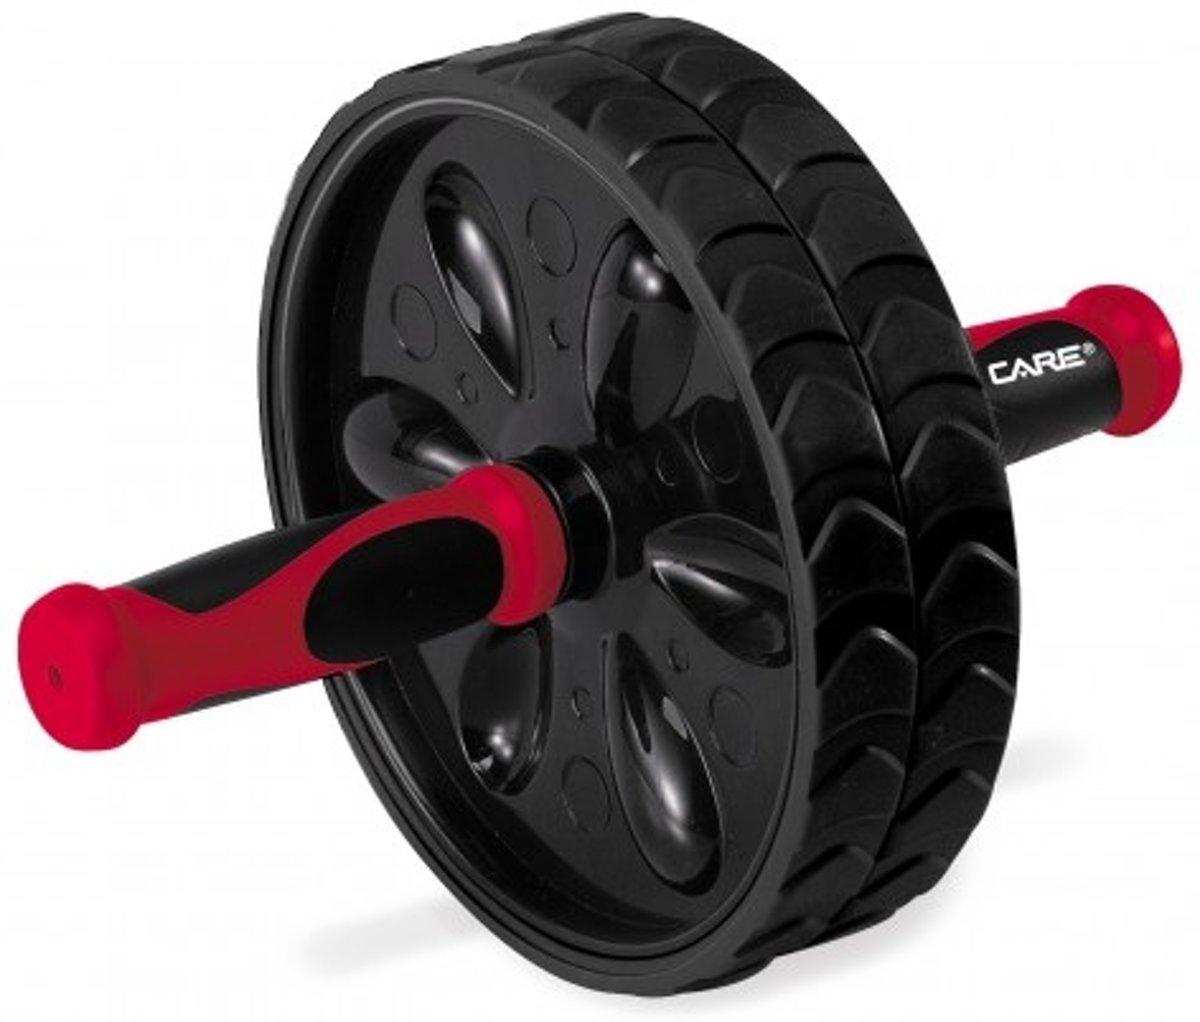 Care Fitness - Ab wheel - Buikspier wiel - Ab roller / Core en buikspiertrainer